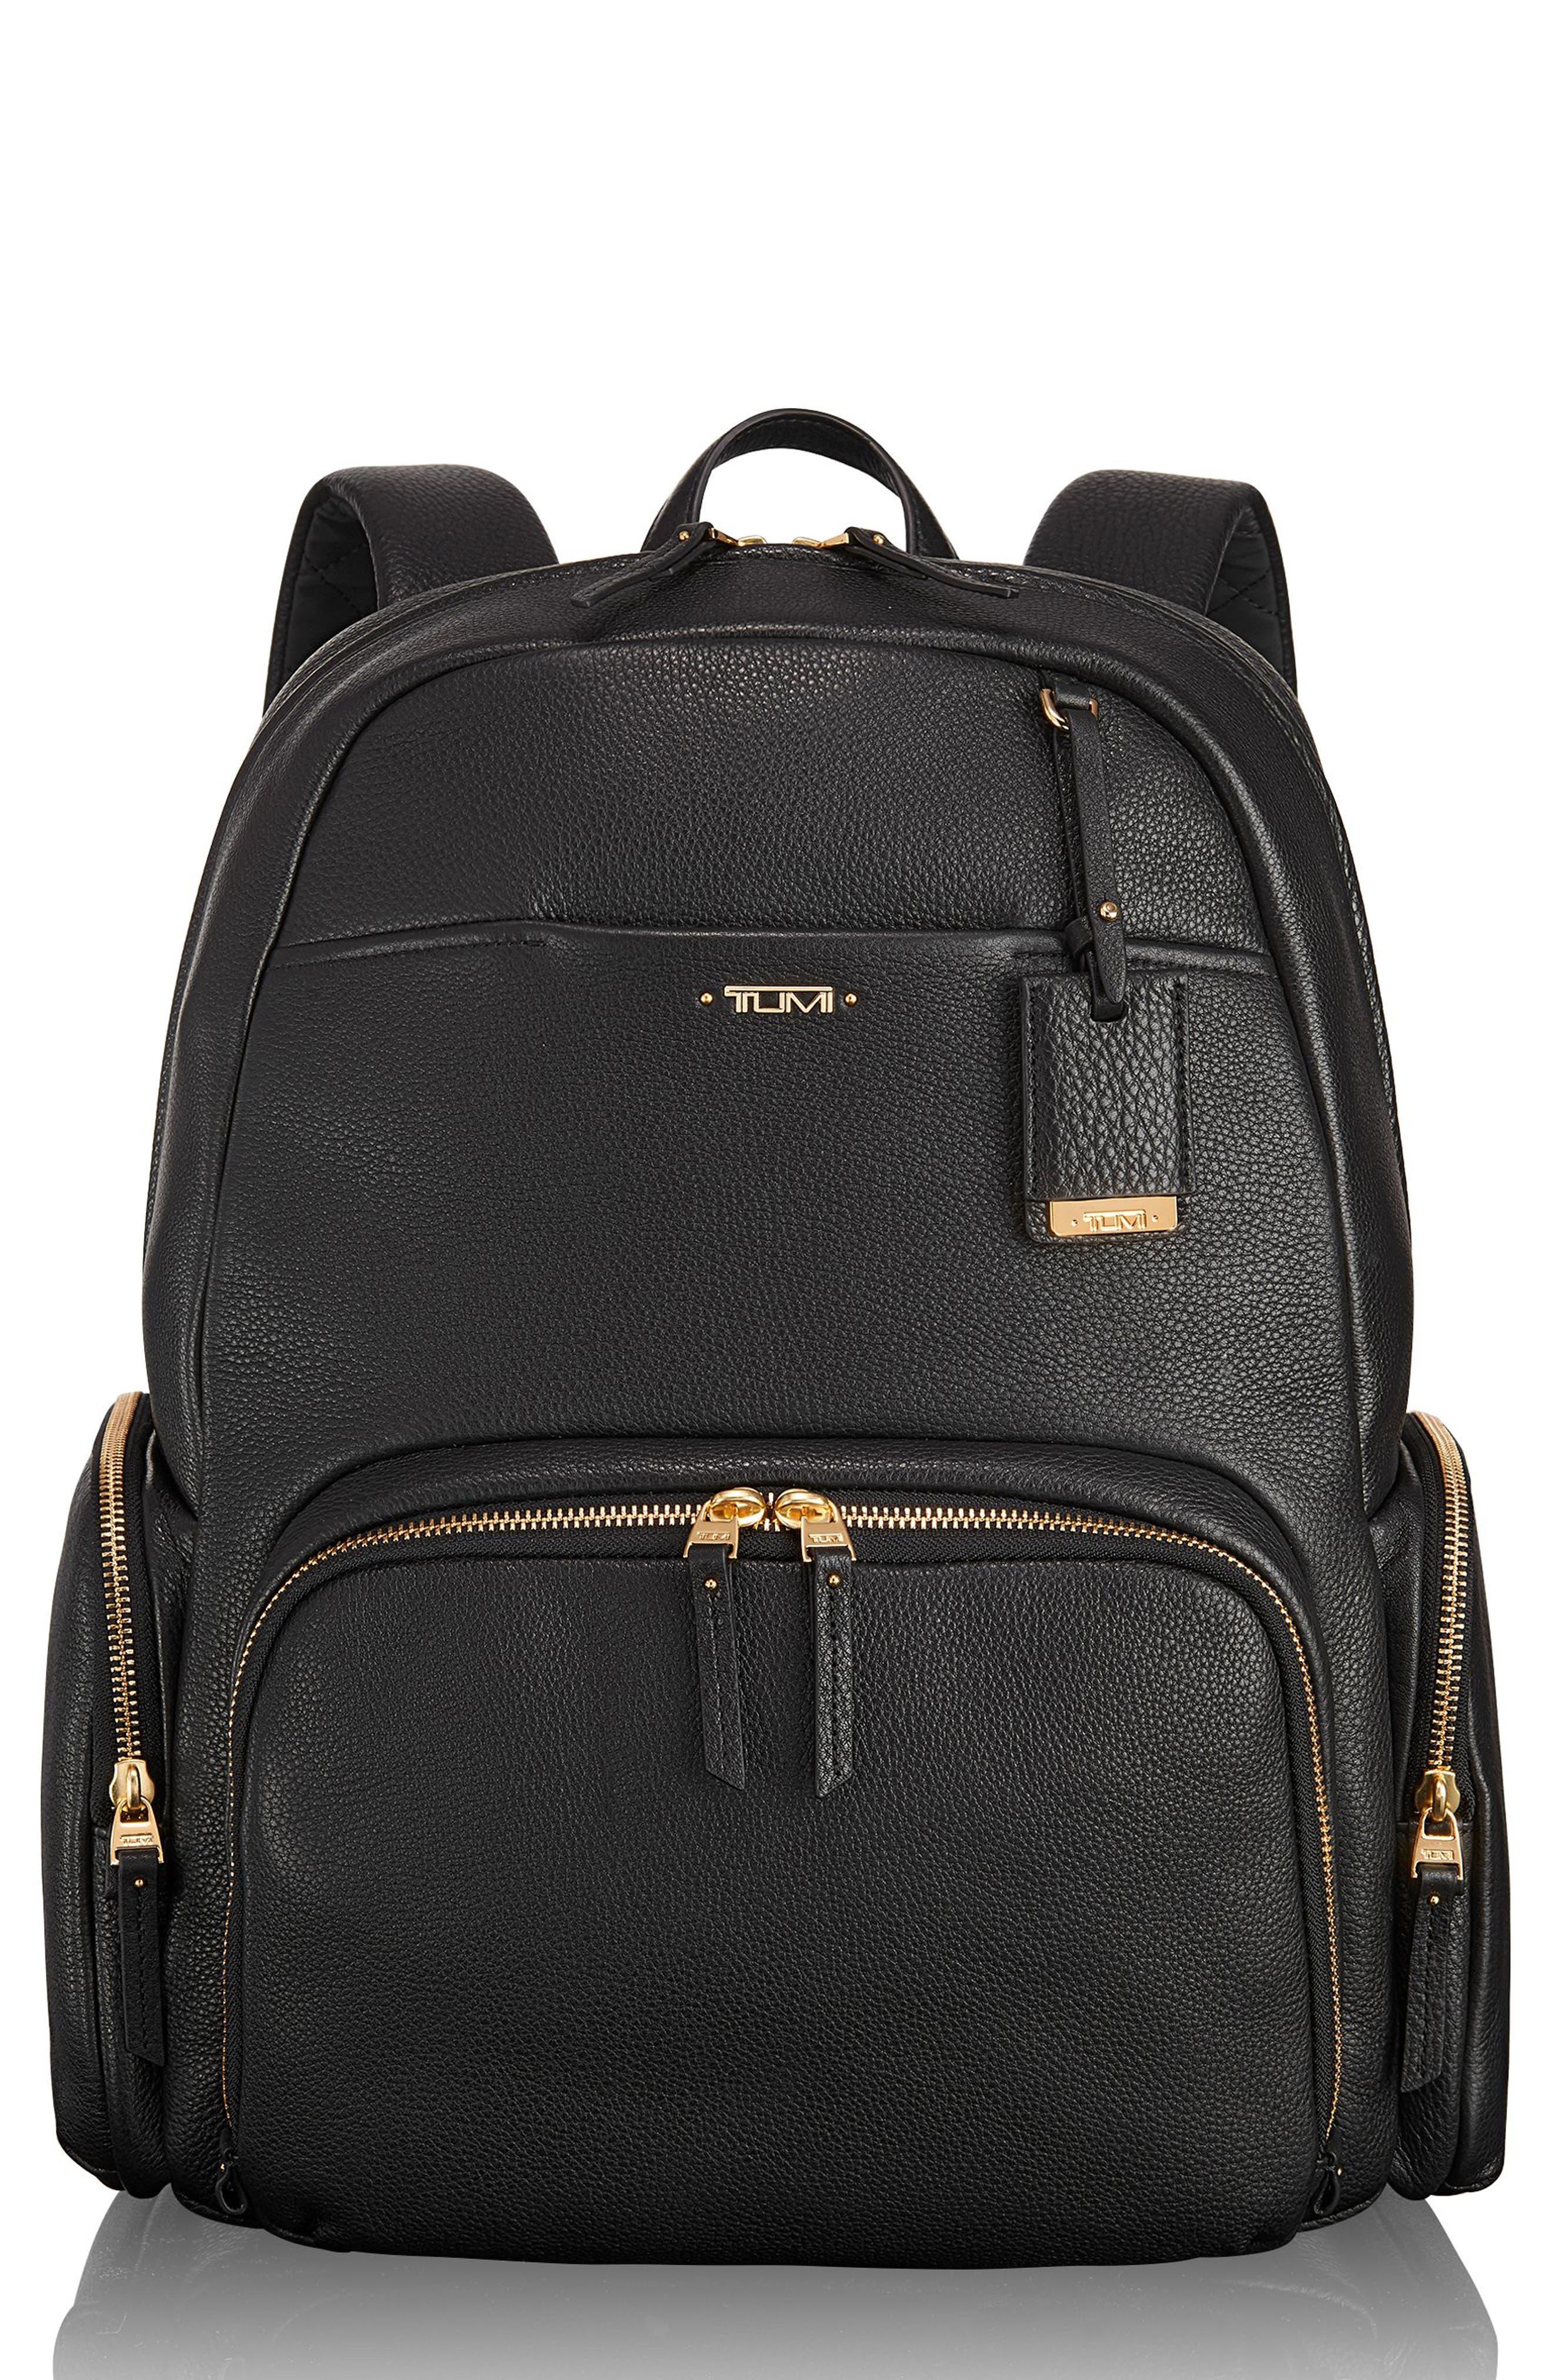 Calais Leather Computer Backpack,                             Main thumbnail 1, color,                             Black